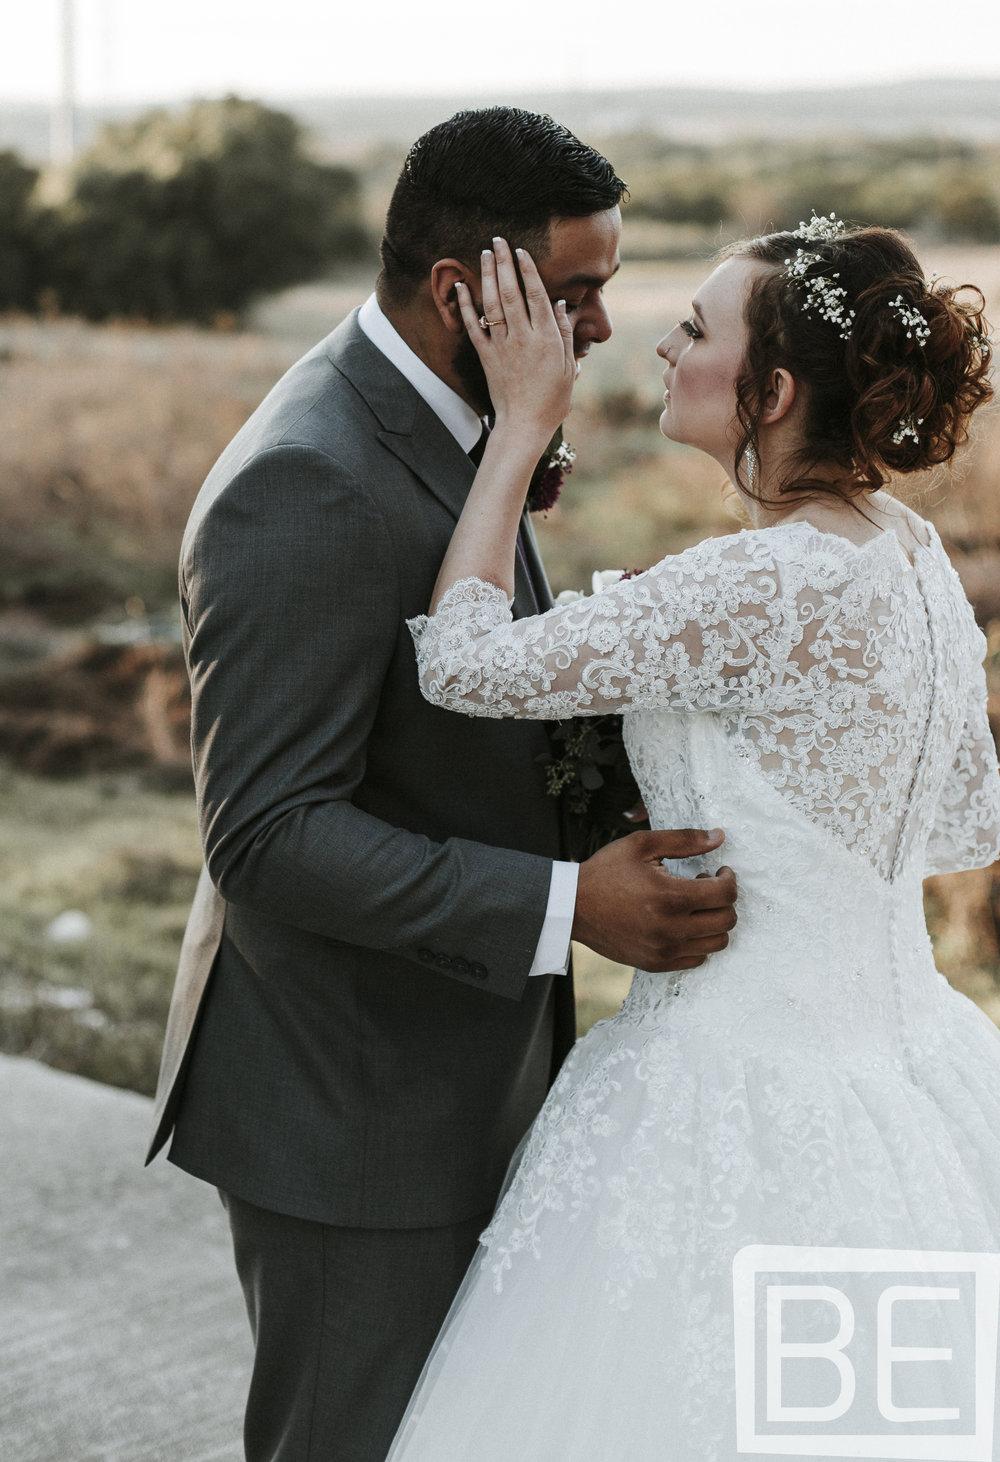 San Antonio Wedding - Soriano Wedding - Tanner Beason Photography-16.jpg